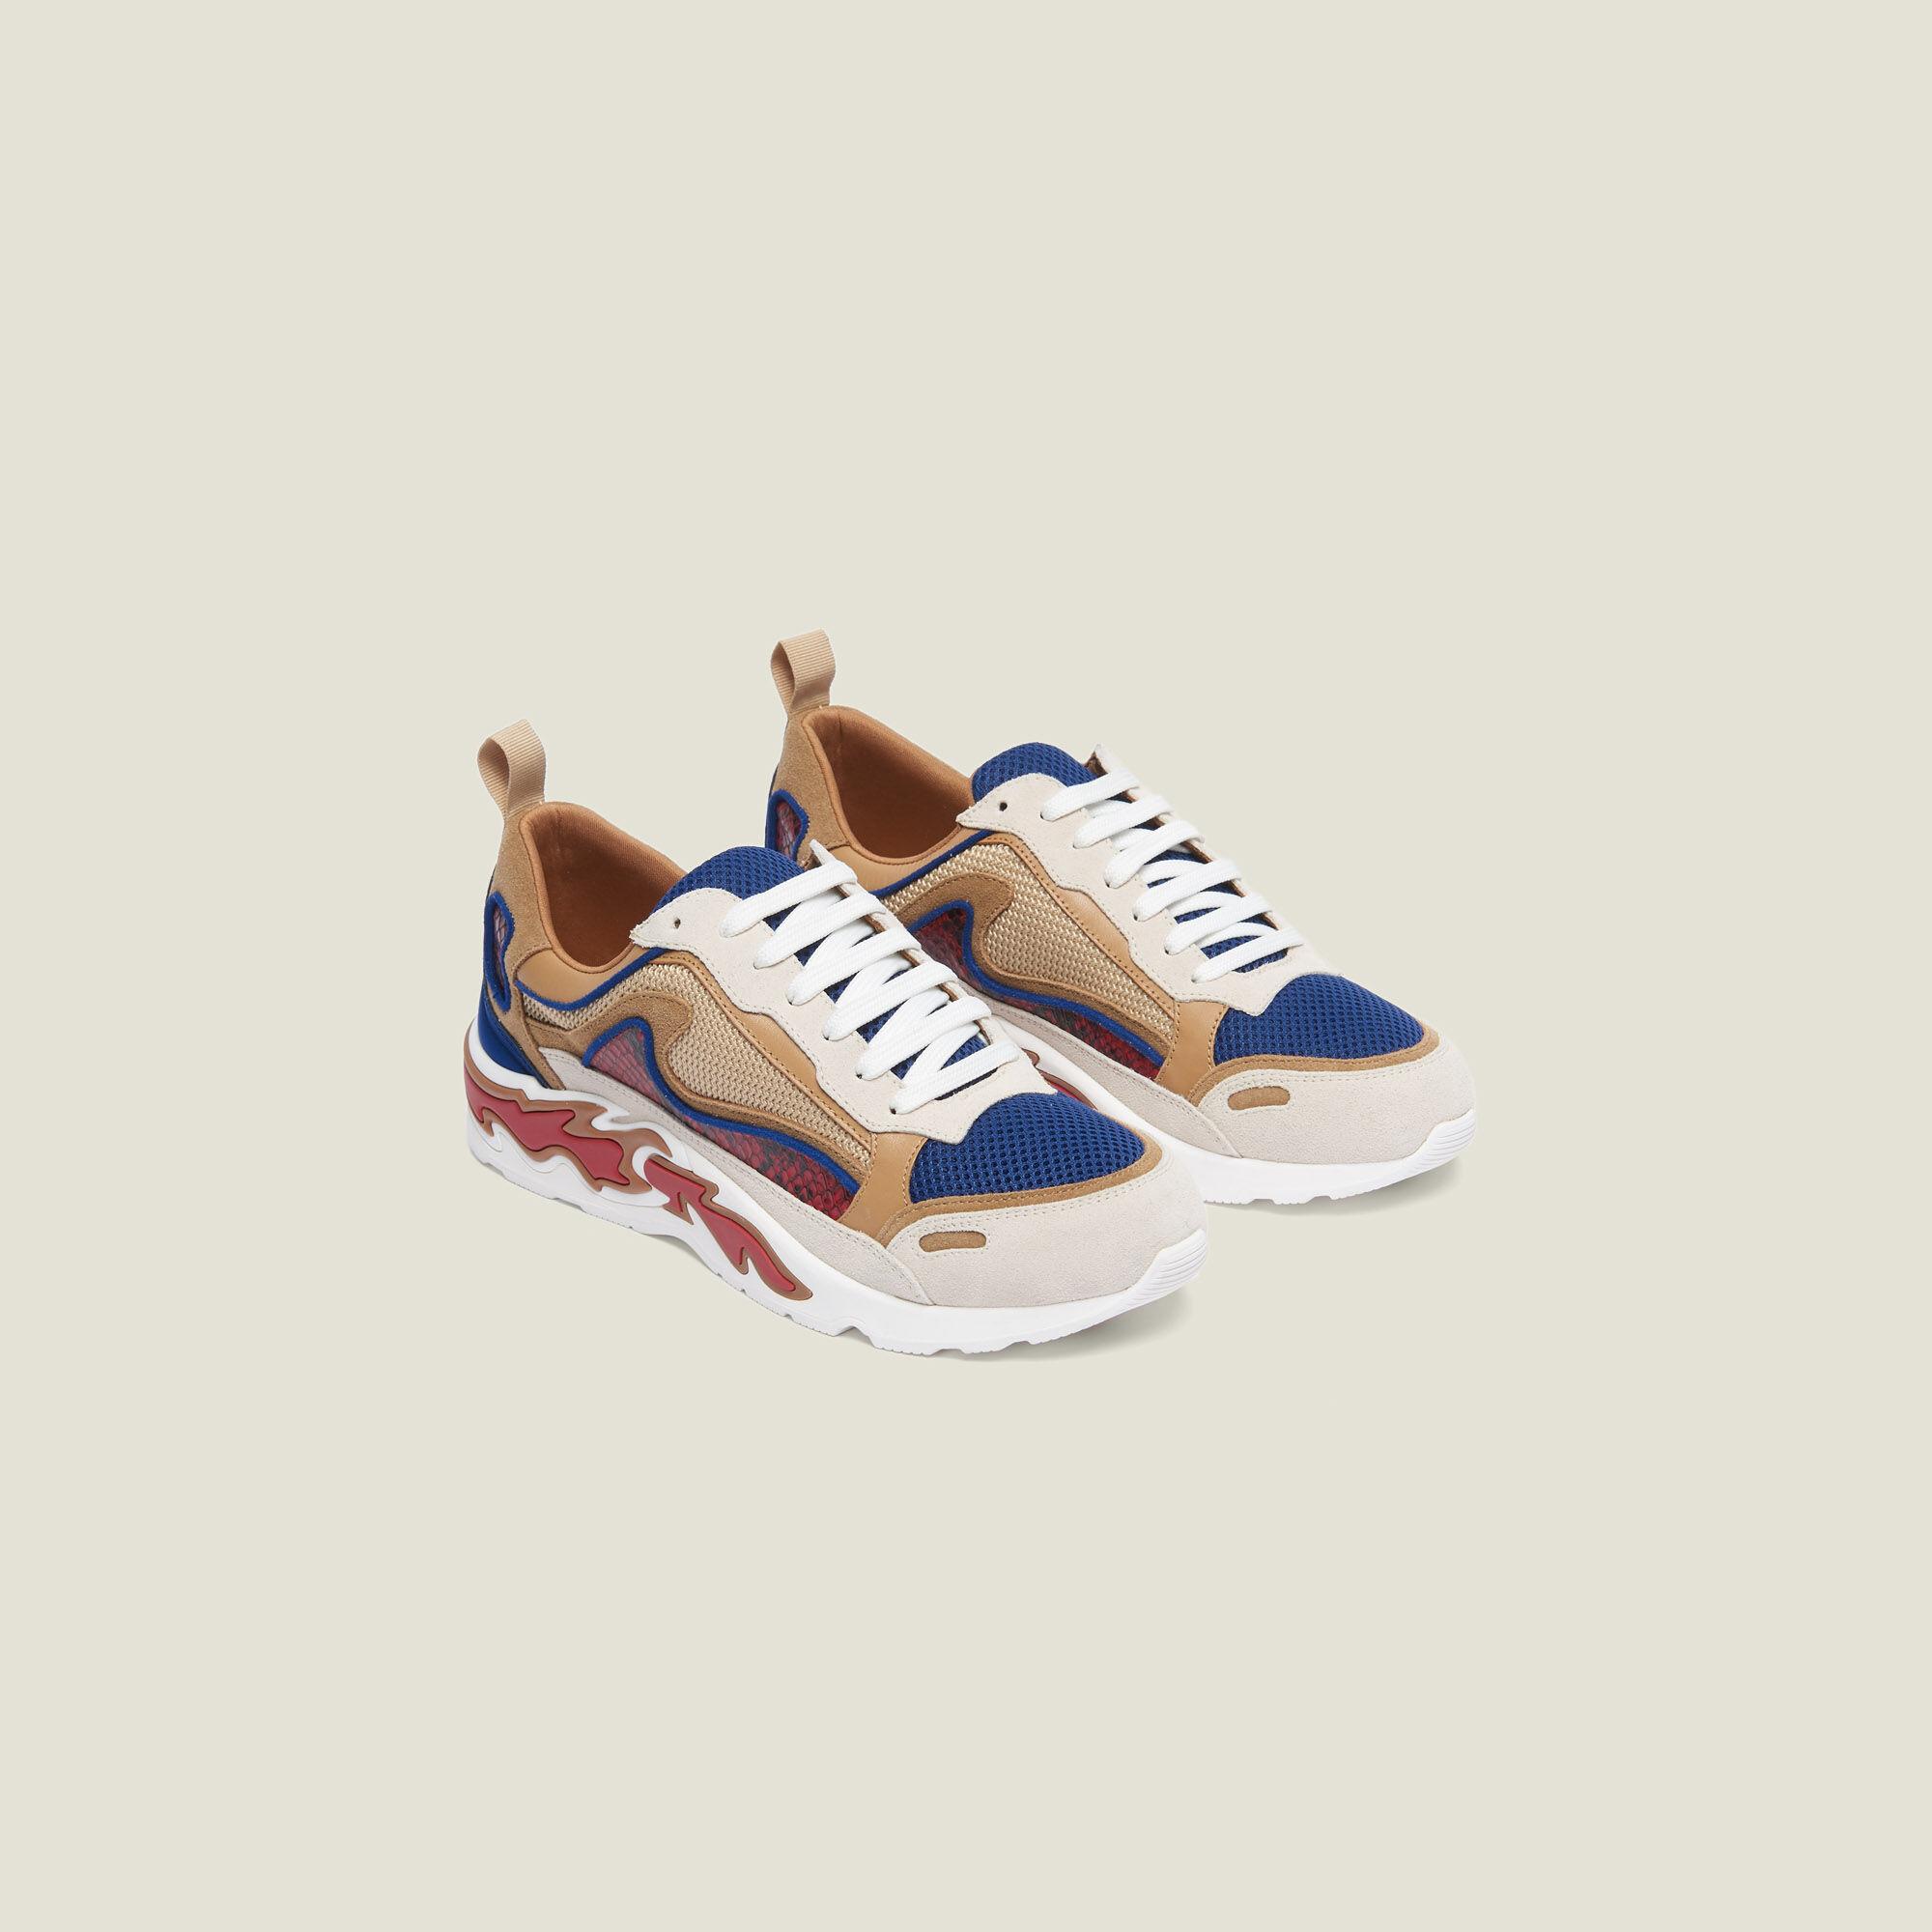 Flame sneakers - Sneakers | Sandro Paris